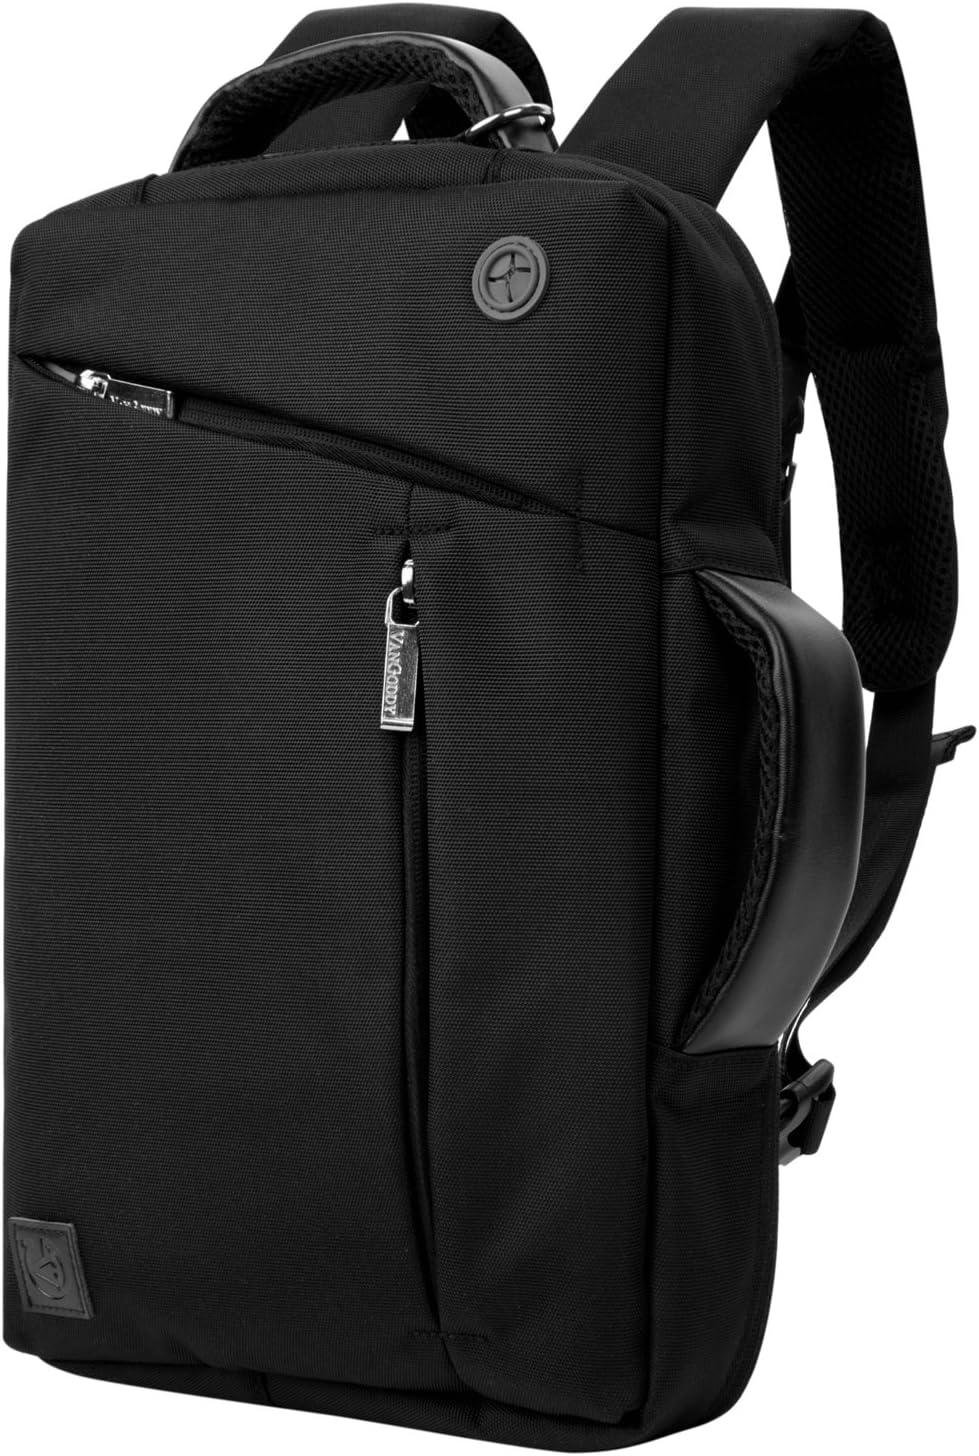 Vangoddy Slate 3 in 1 Hybrid Universal Laptop Carrying Bag, Size 11 inch, Onyx Black